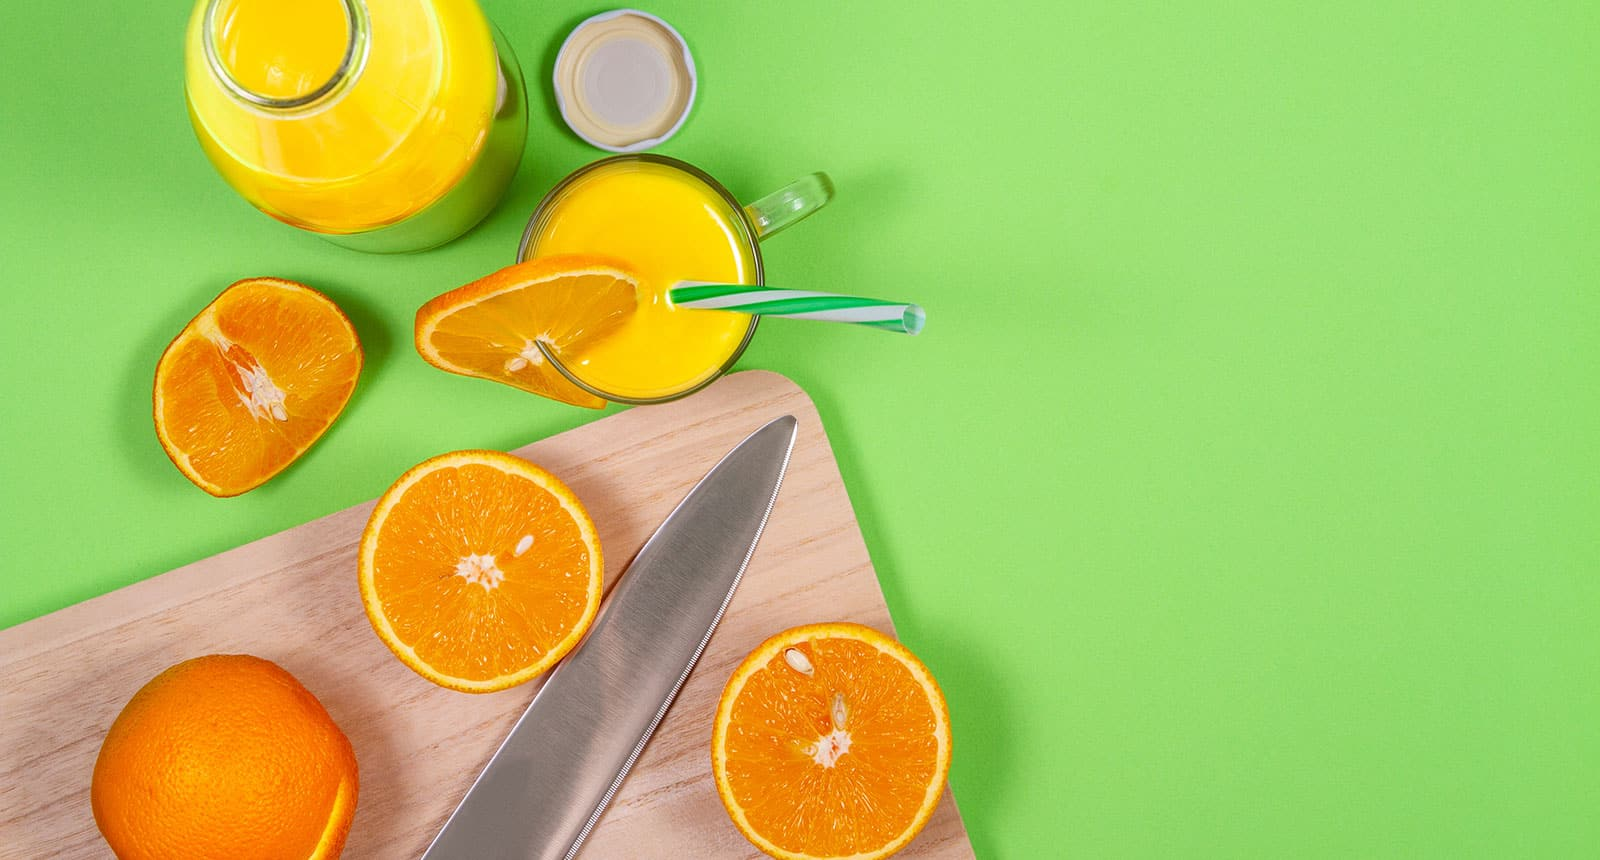 Utility Knife Cut Citrus